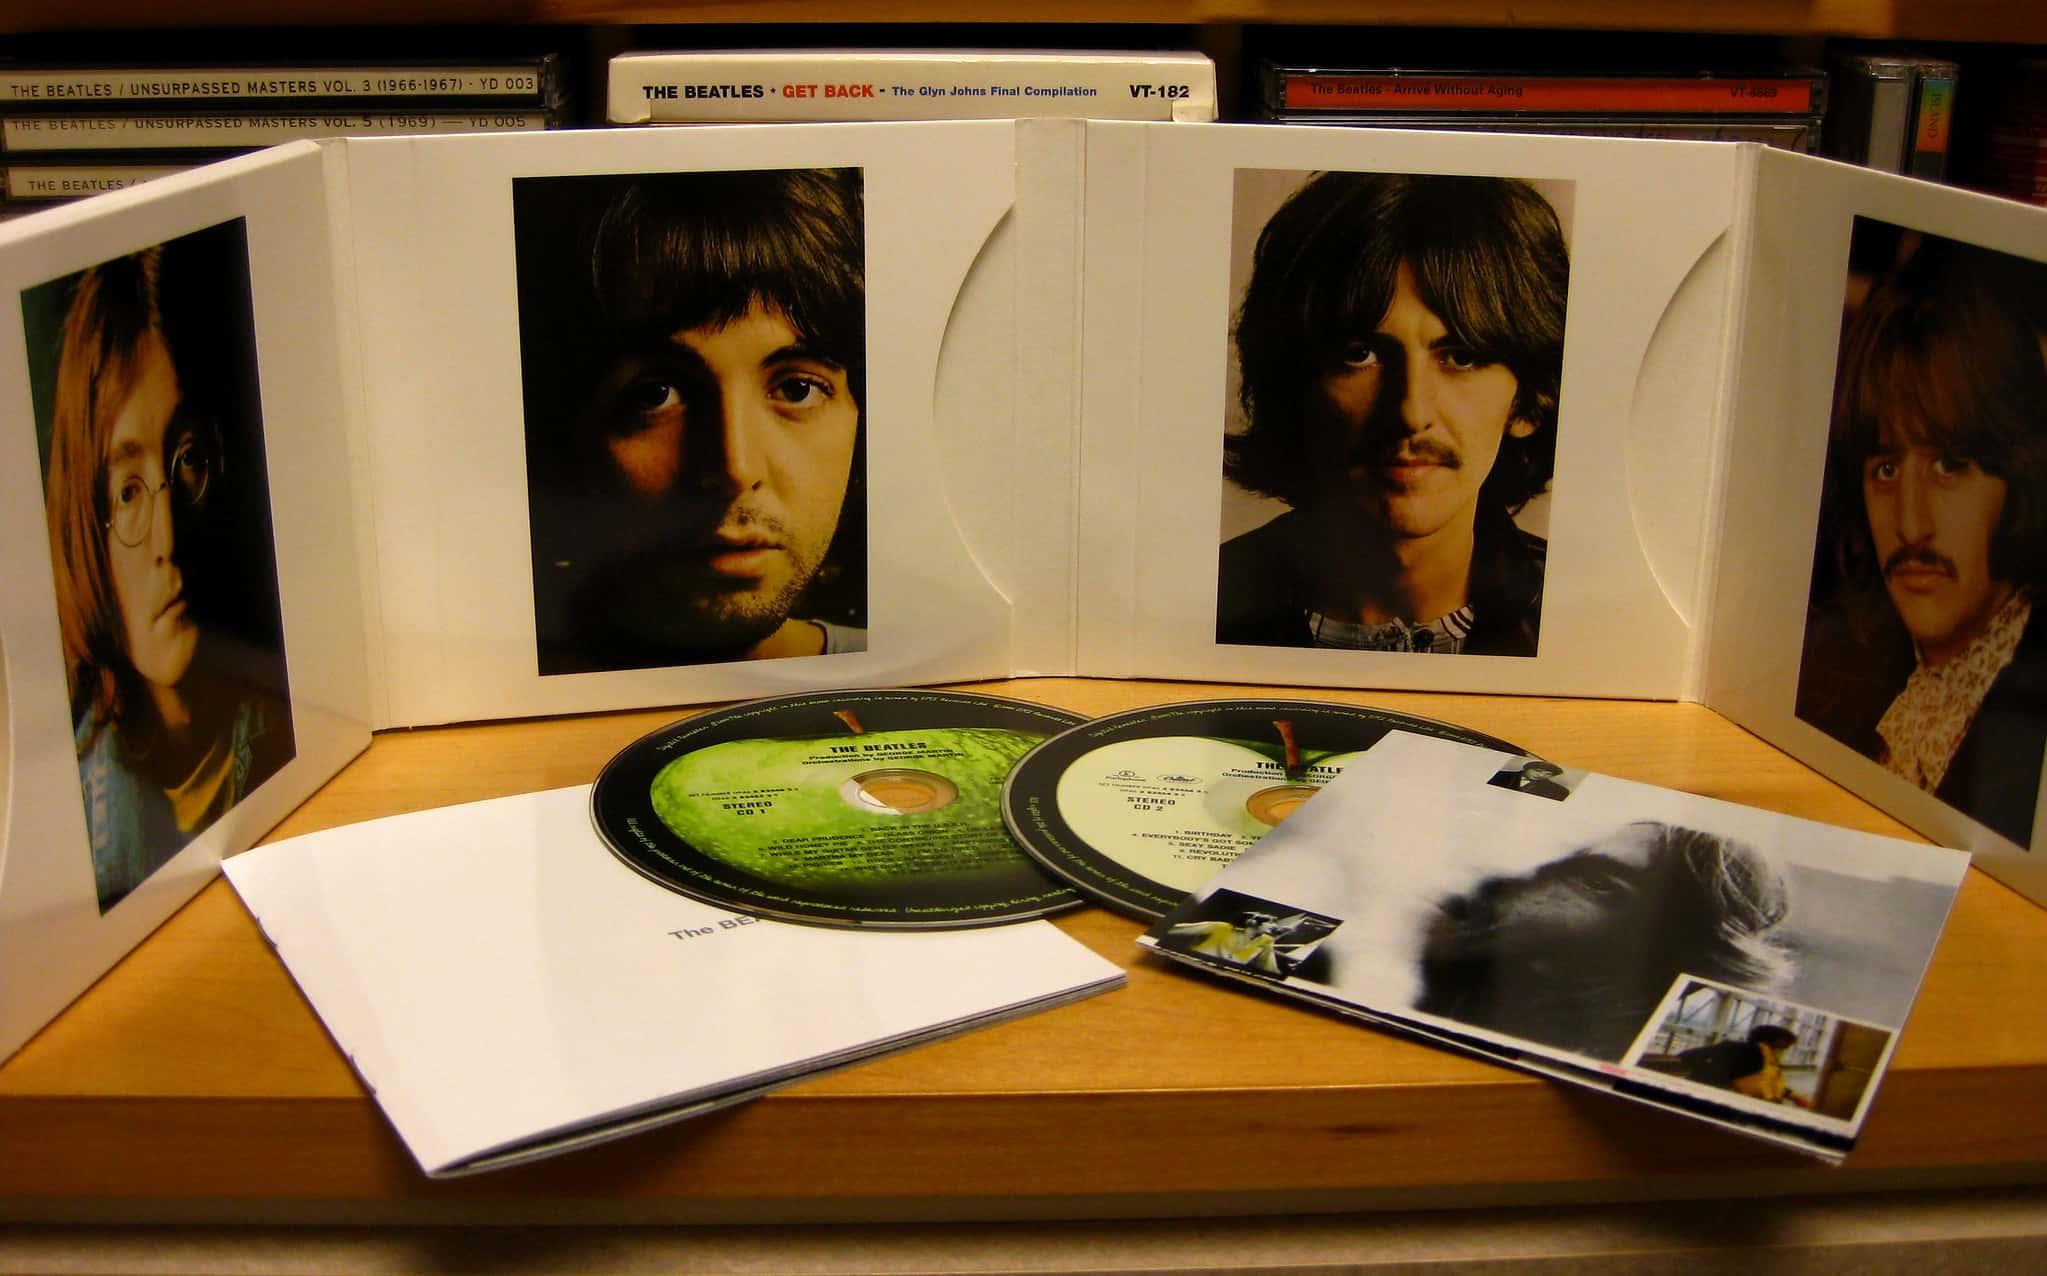 Paul McCartney facts